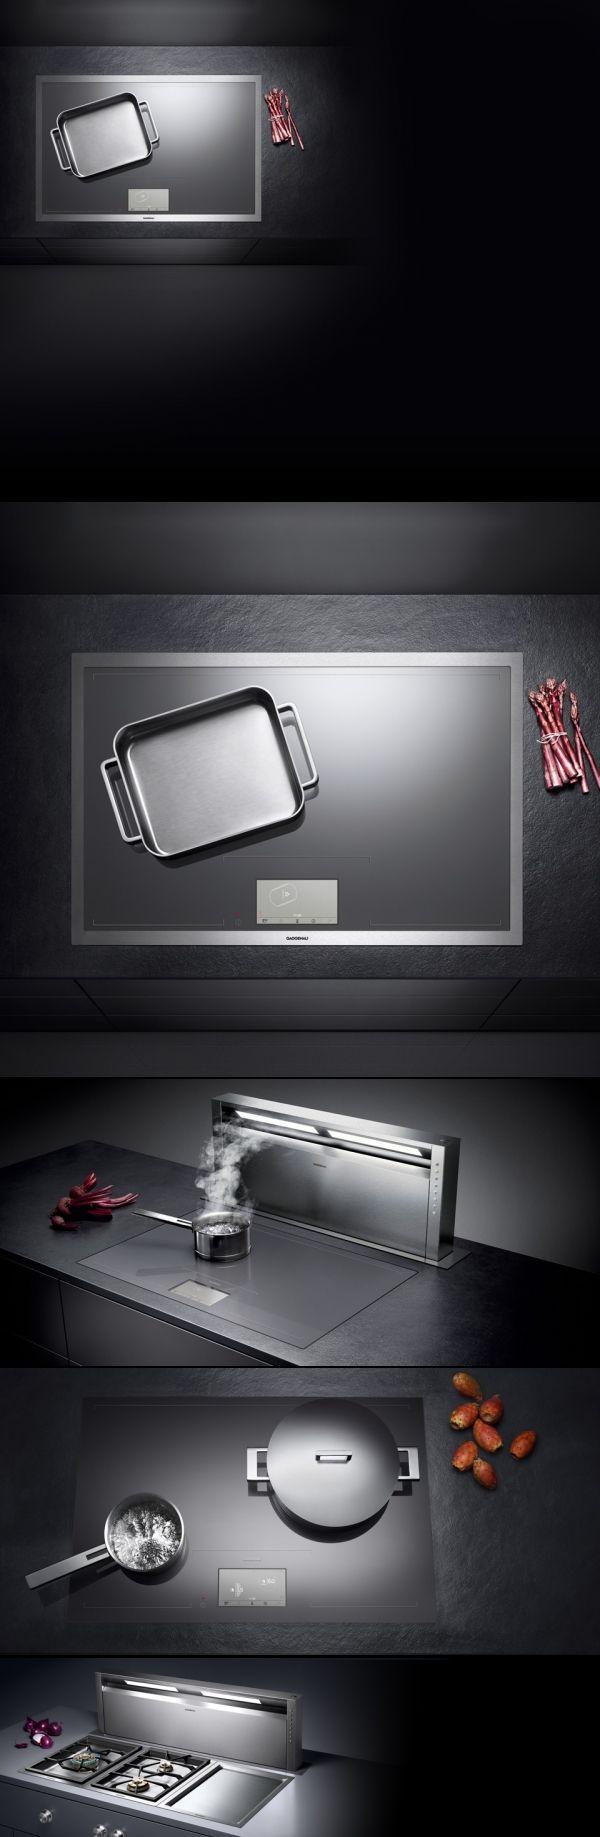 best stoves images on pinterest